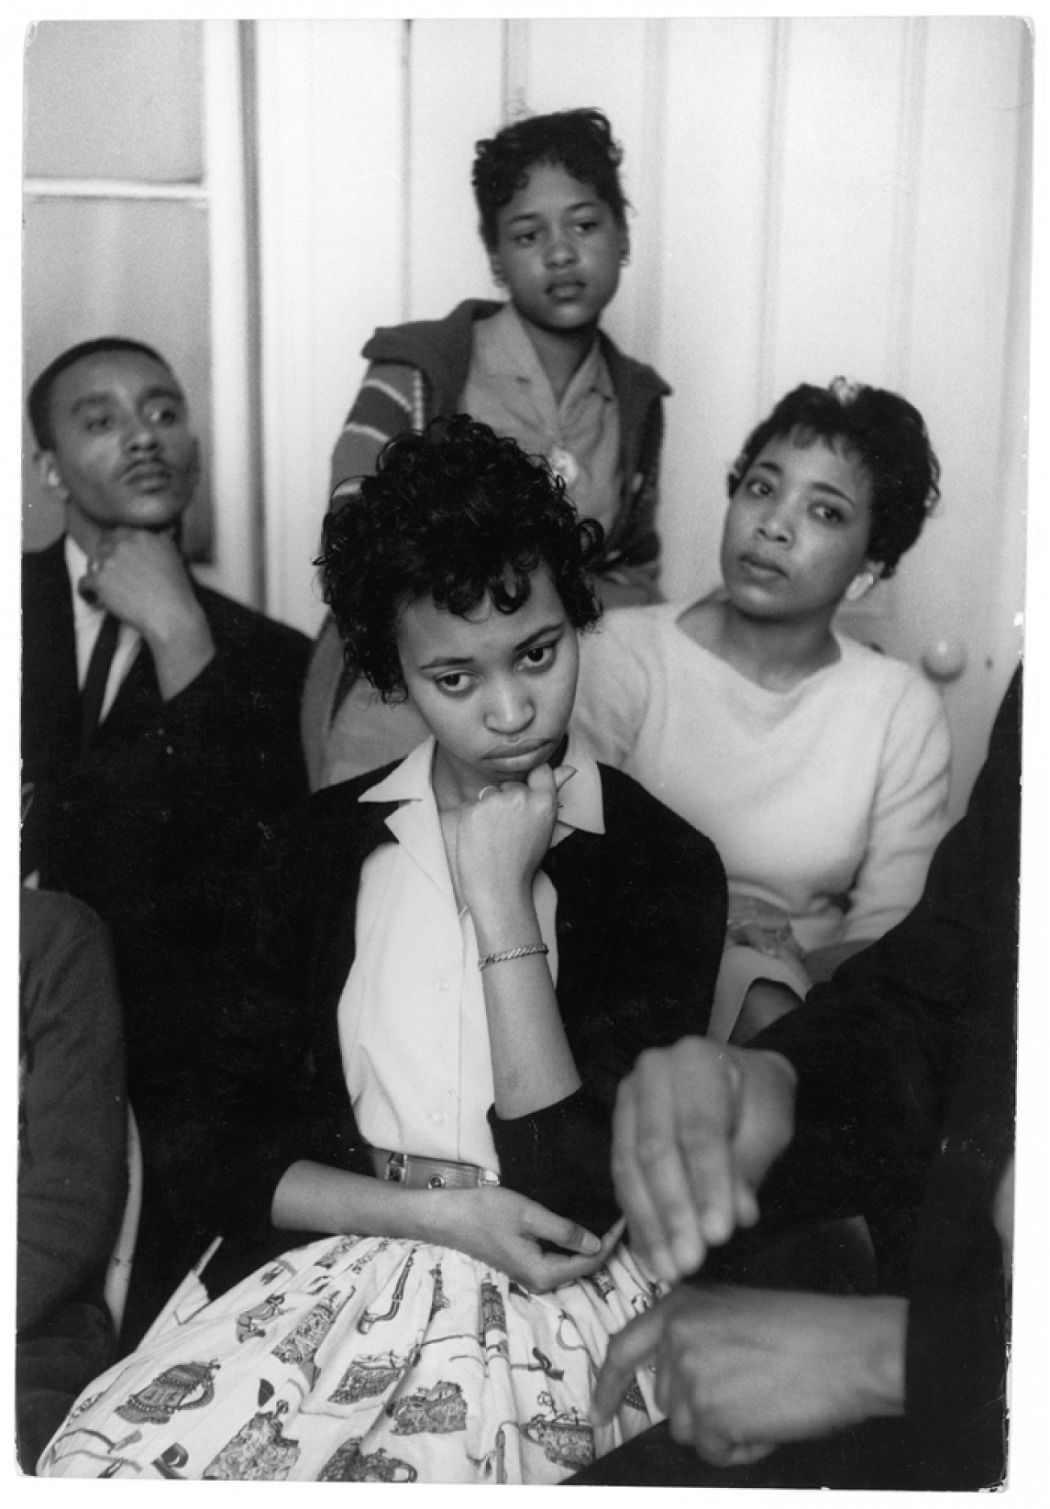 Eve Arnold, Institut pour la non-violence, Virginie, 1960  Eve Arnold/Magnum Photos